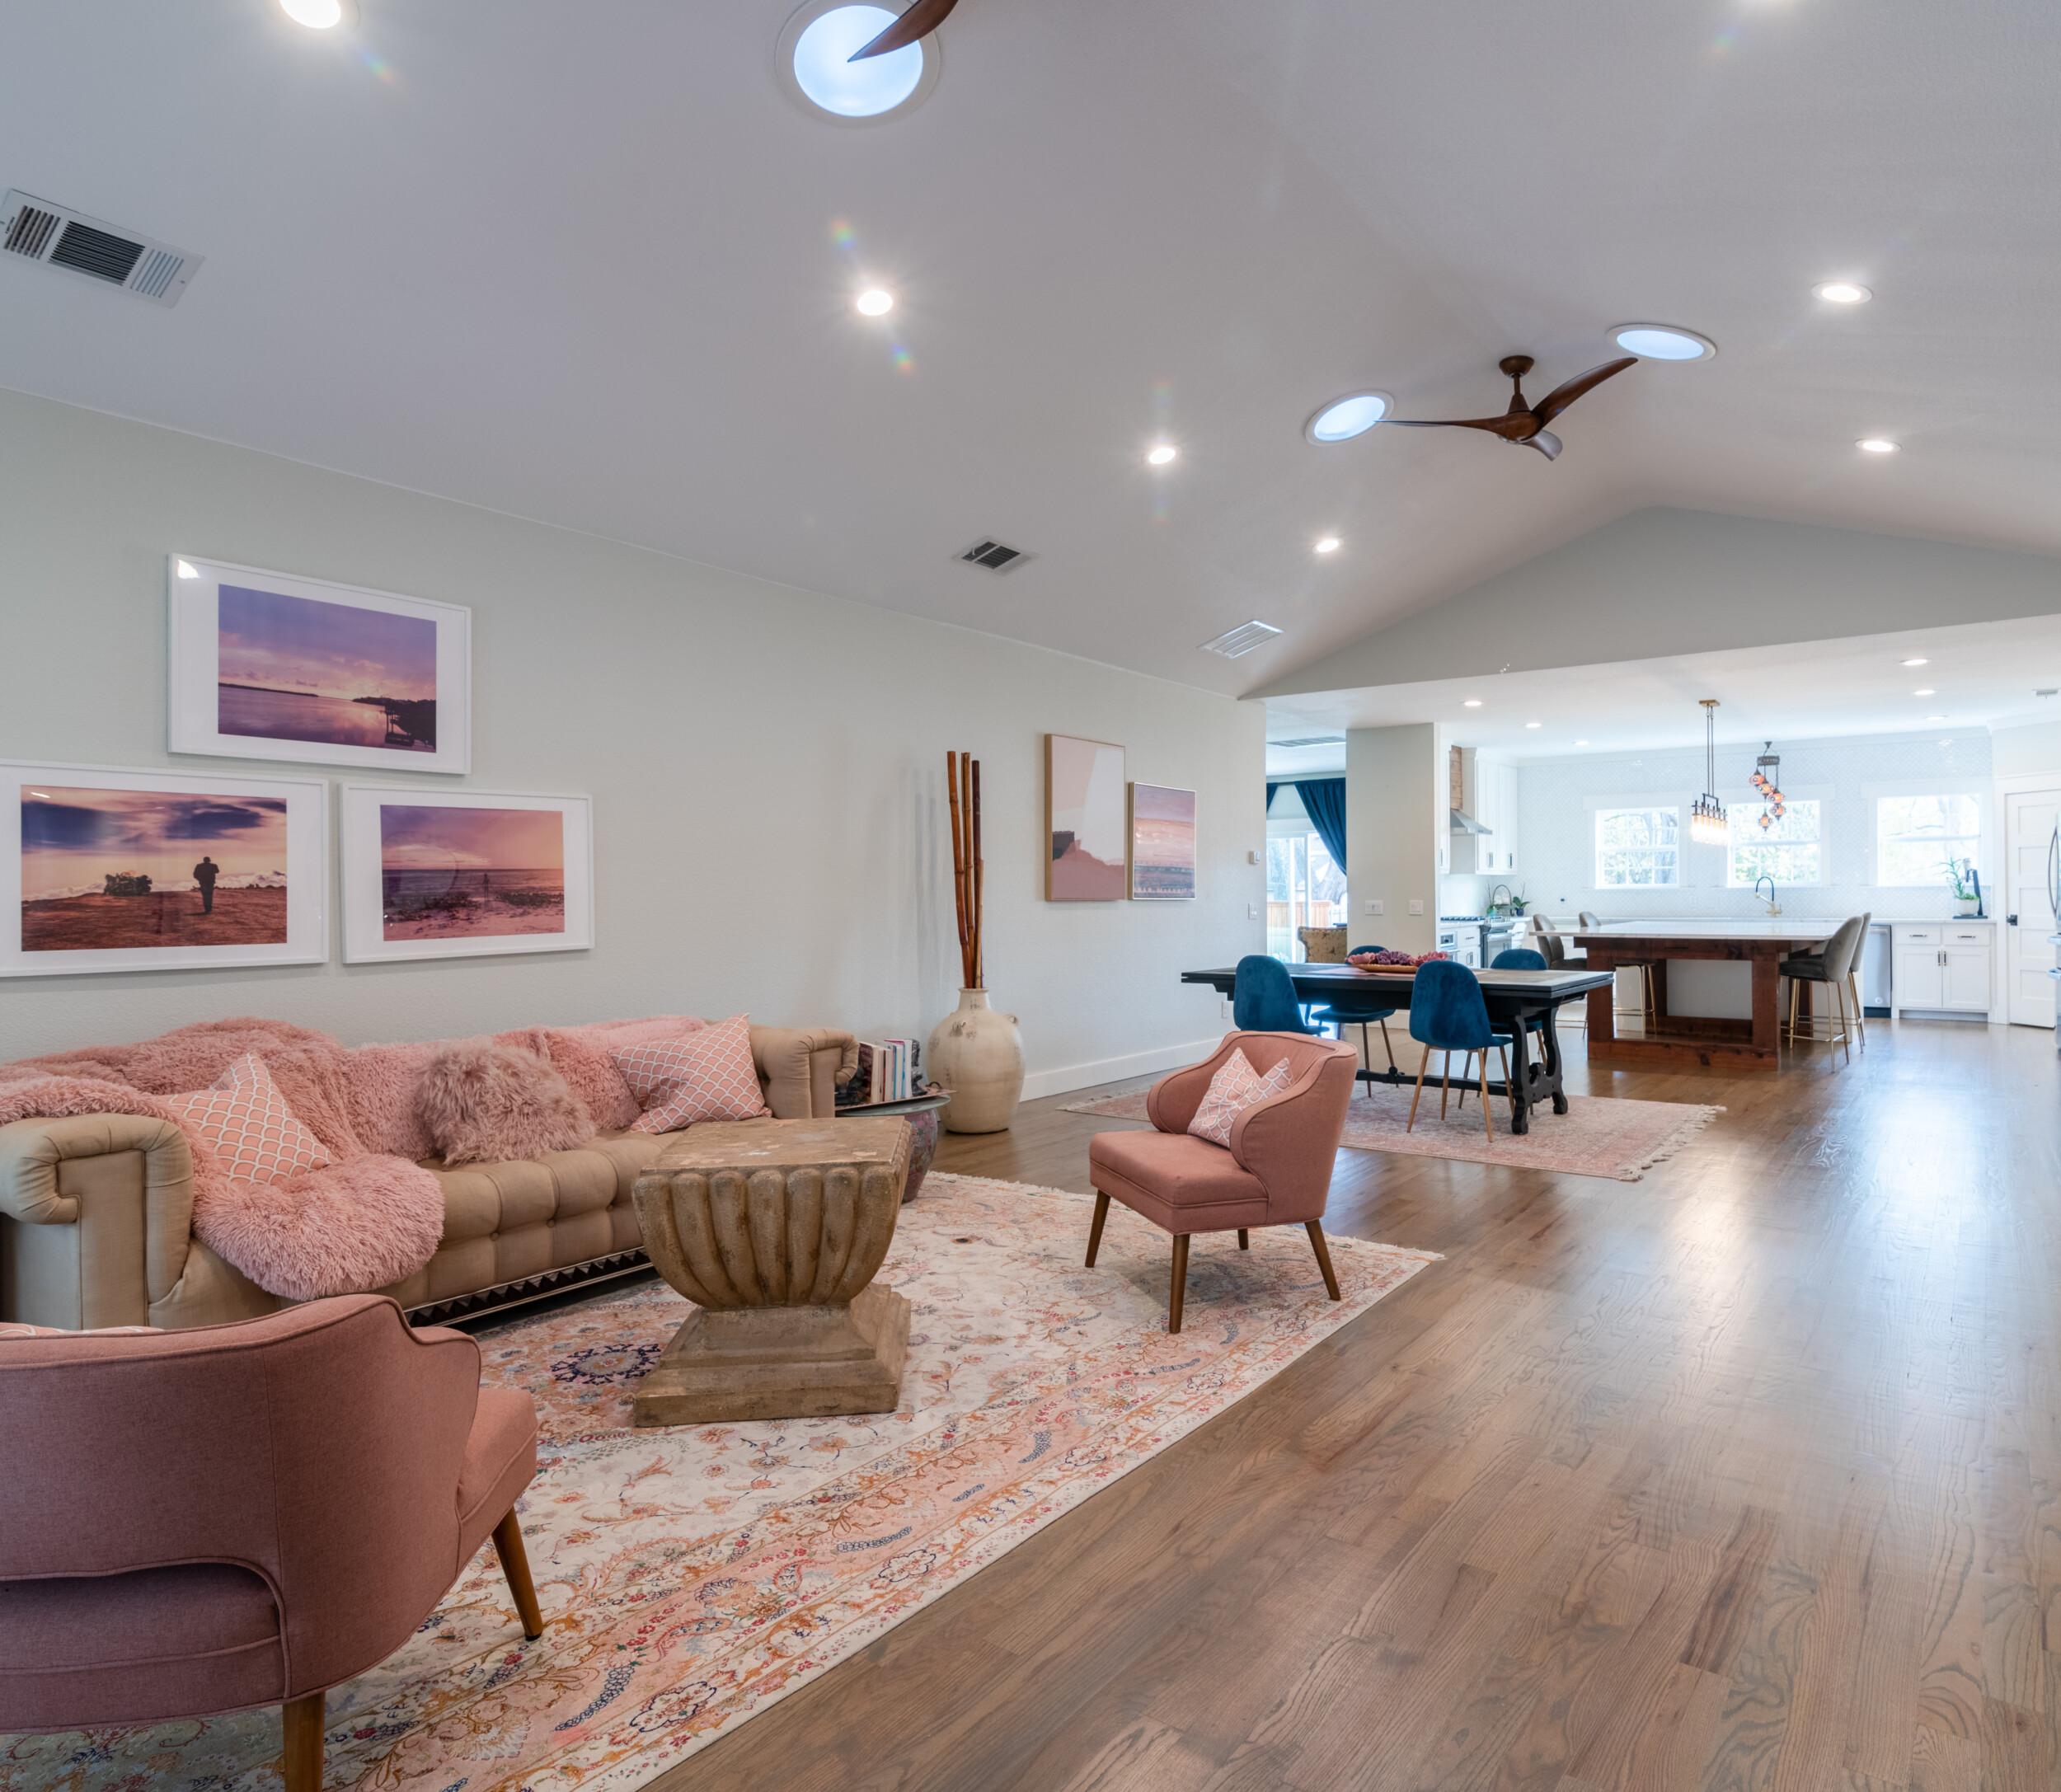 transitional living room interior design